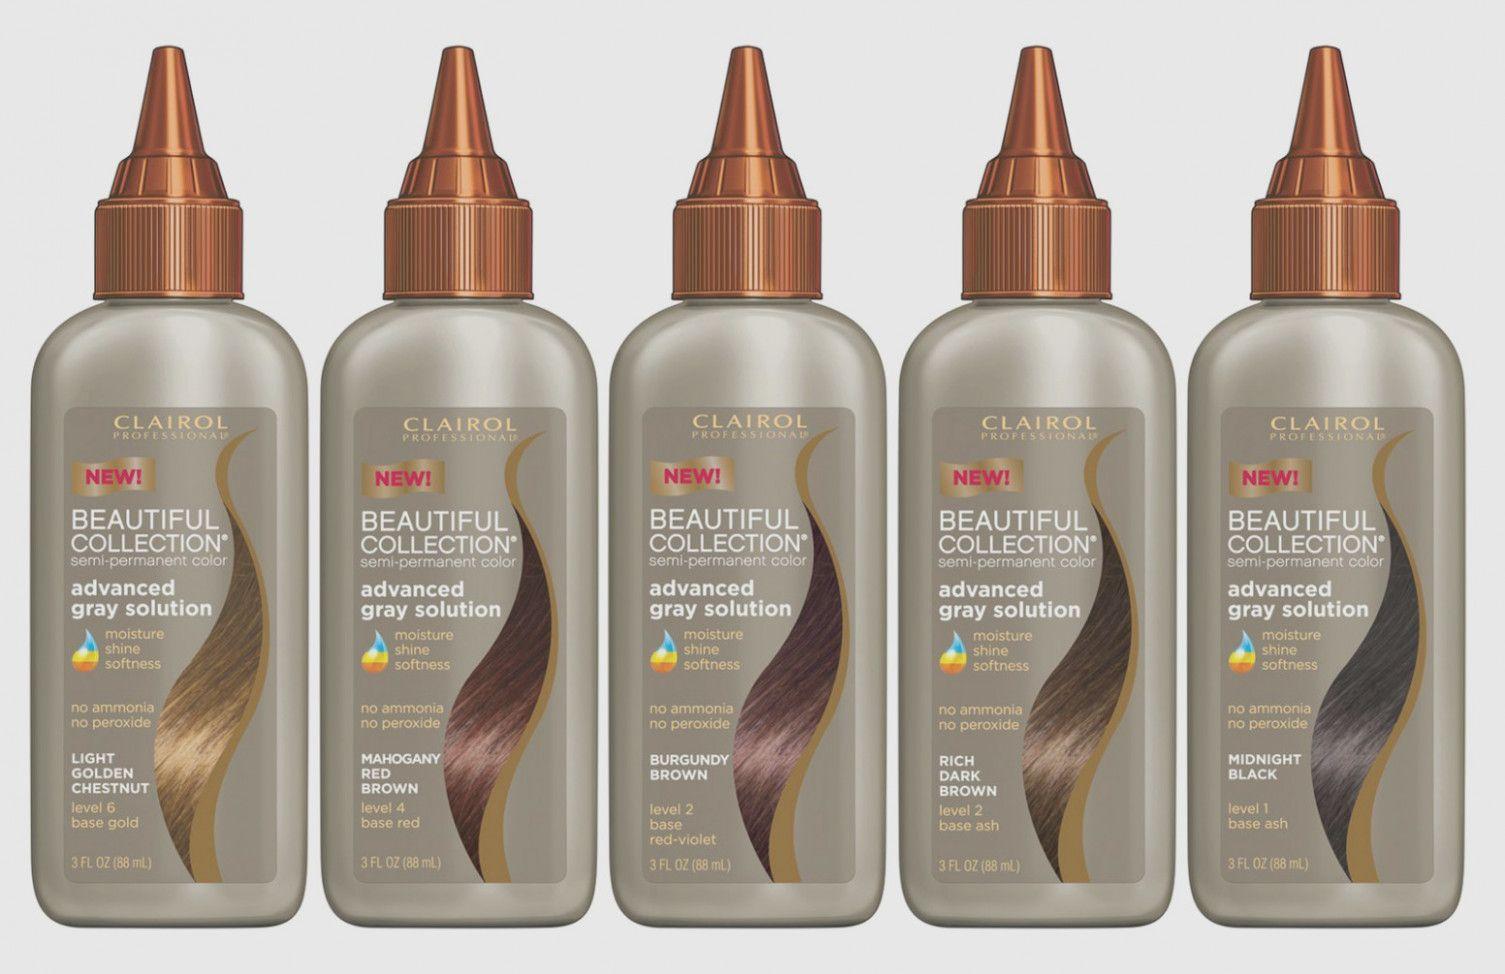 Clairol Professional Hair Color Chart Er Sa Kjent Men Hvorfor Clairol Professional Hai Shampoo For Gray Hair Permanent Hair Color Semi Permanent Hair Color